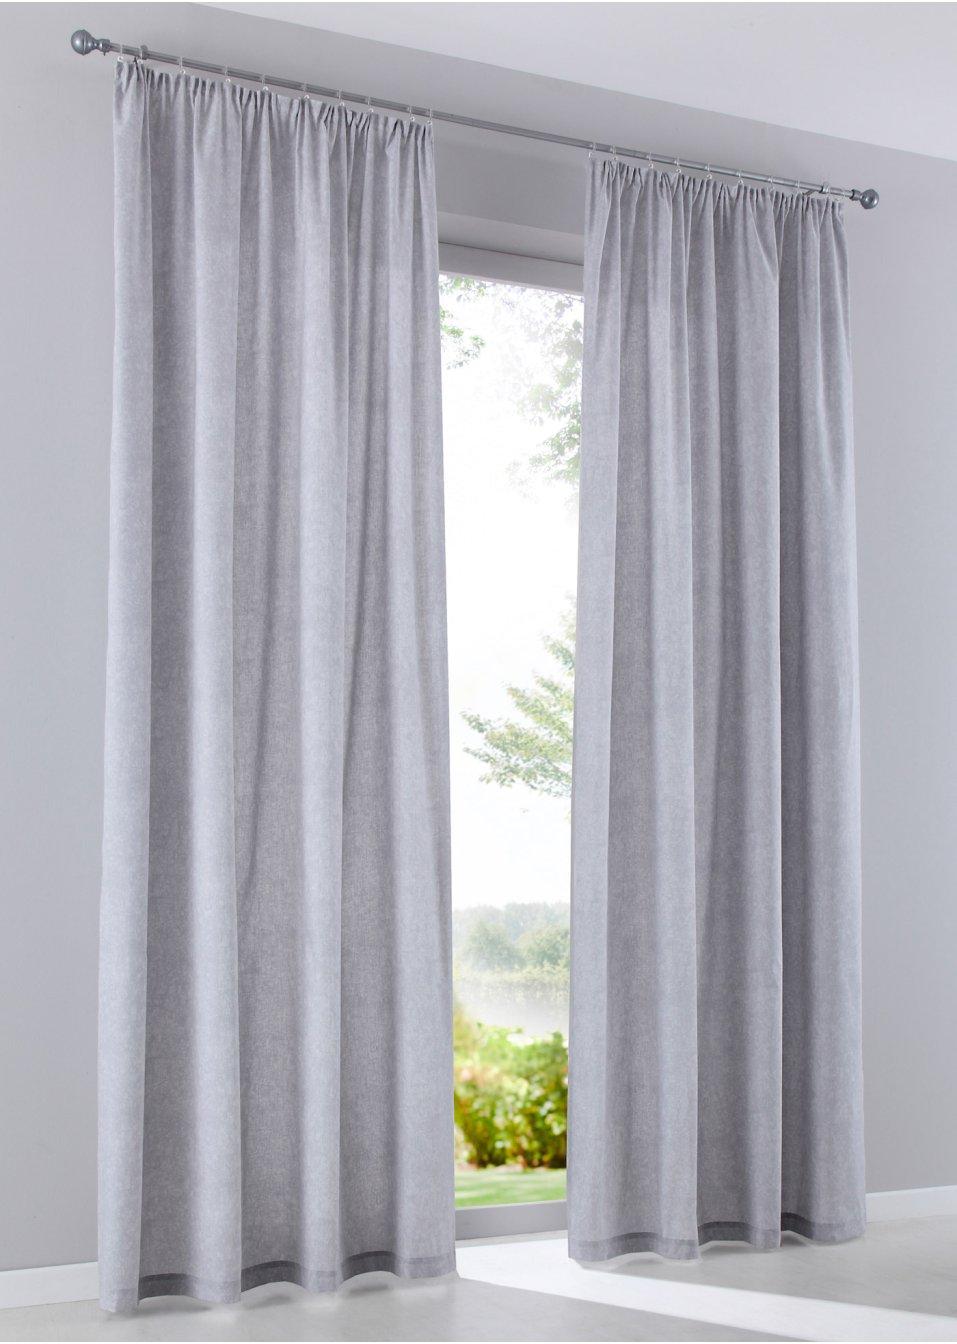 Vorhang gunilla 2er pack grau wohnen bpc living - Bonprix vorhang ...